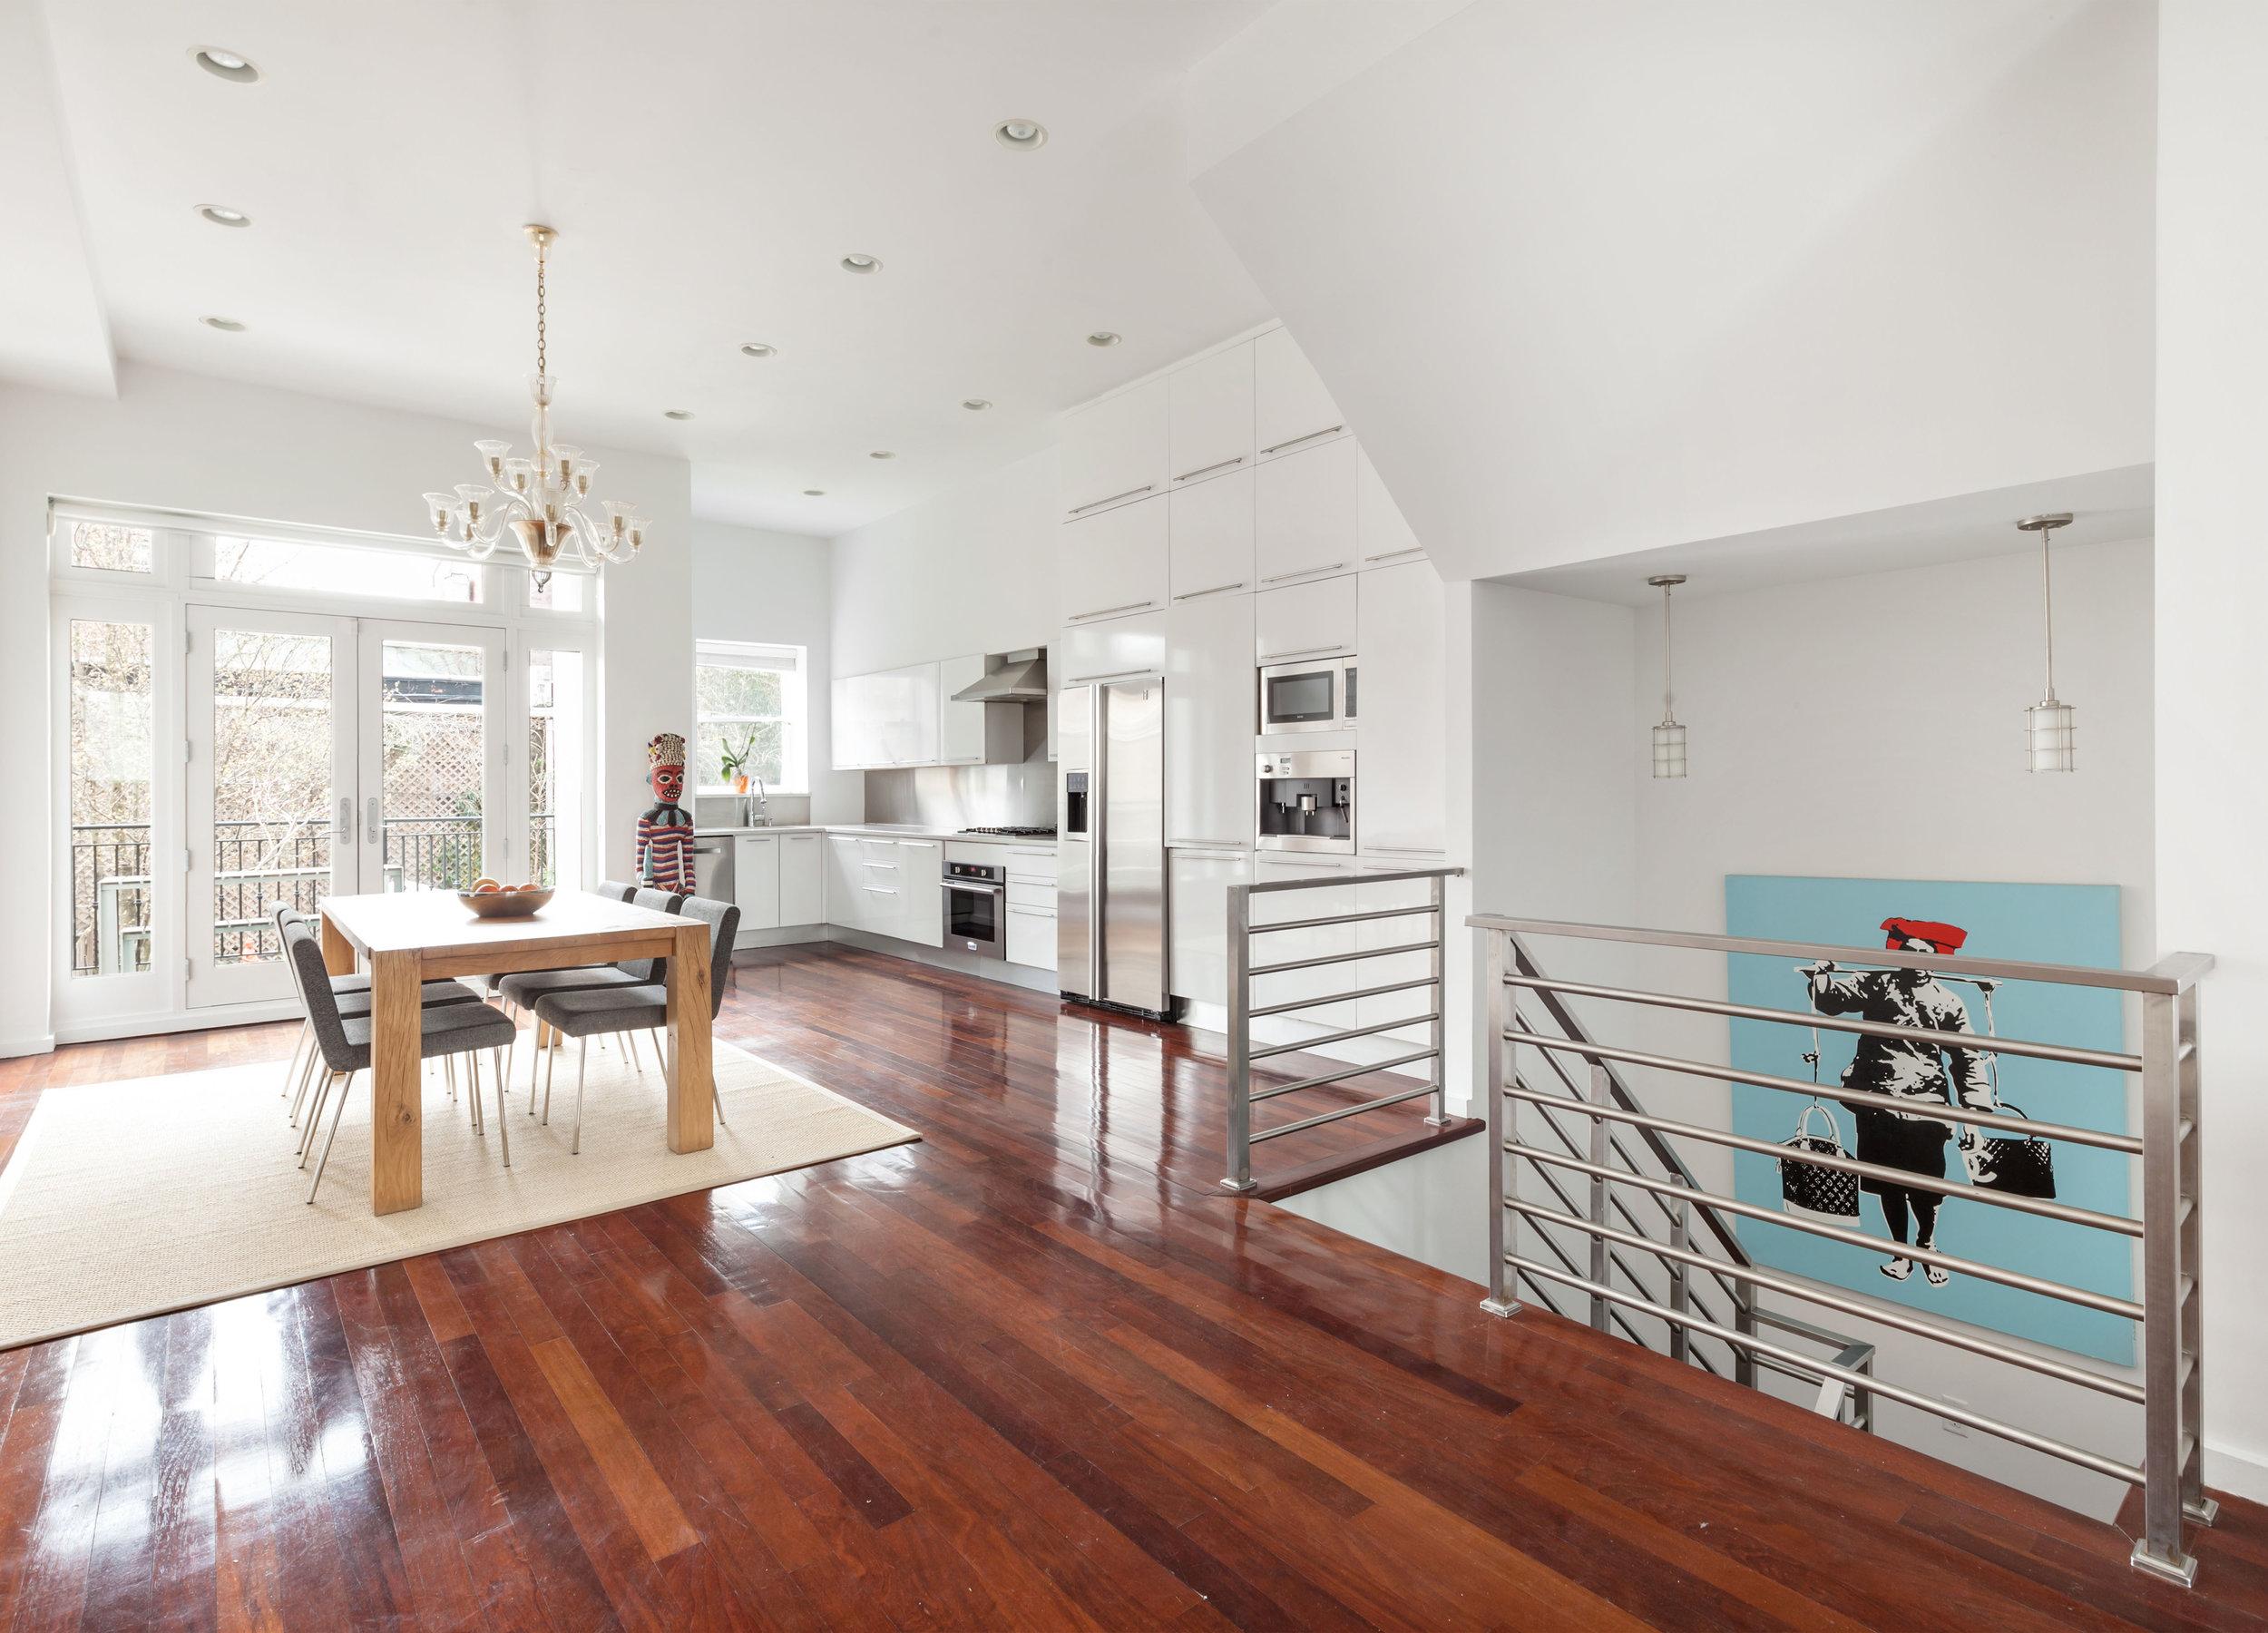 582 Pacific St, Garden Triplex (2-Unit Townhouse Condo)   Park Slope, Brooklyn   $2,495,000  4 Beds | 3.5 Baths | 2,925 SF